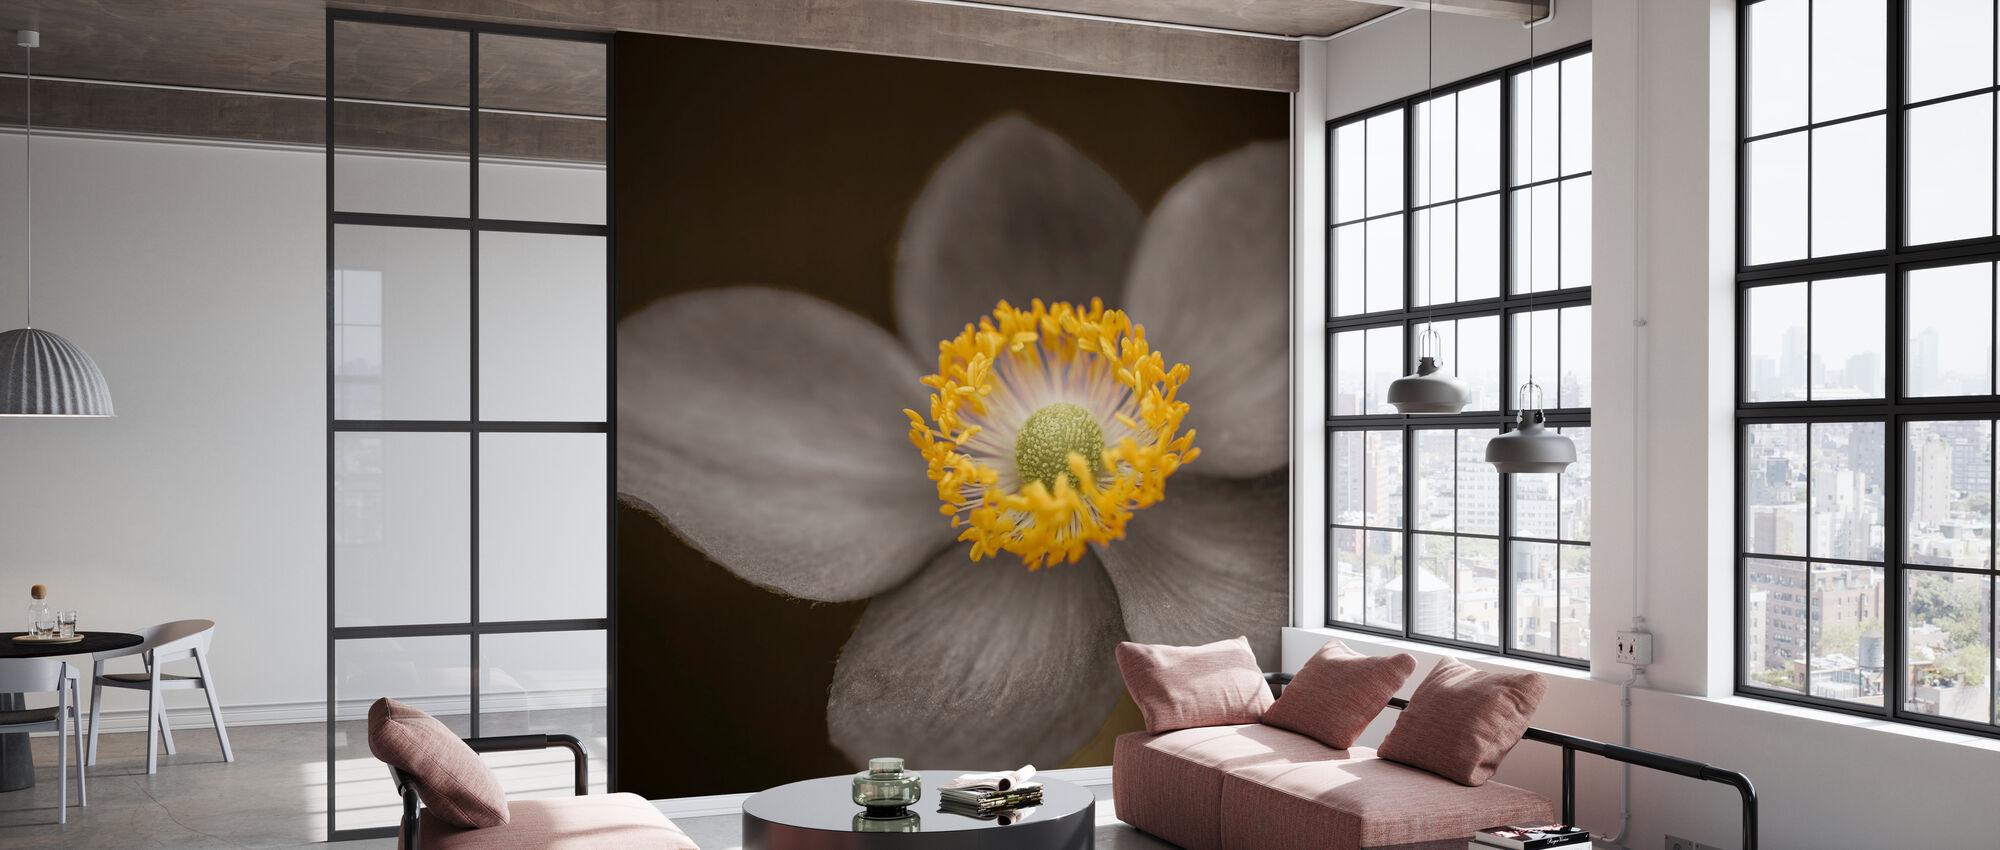 Anemone - Wallpaper - Office